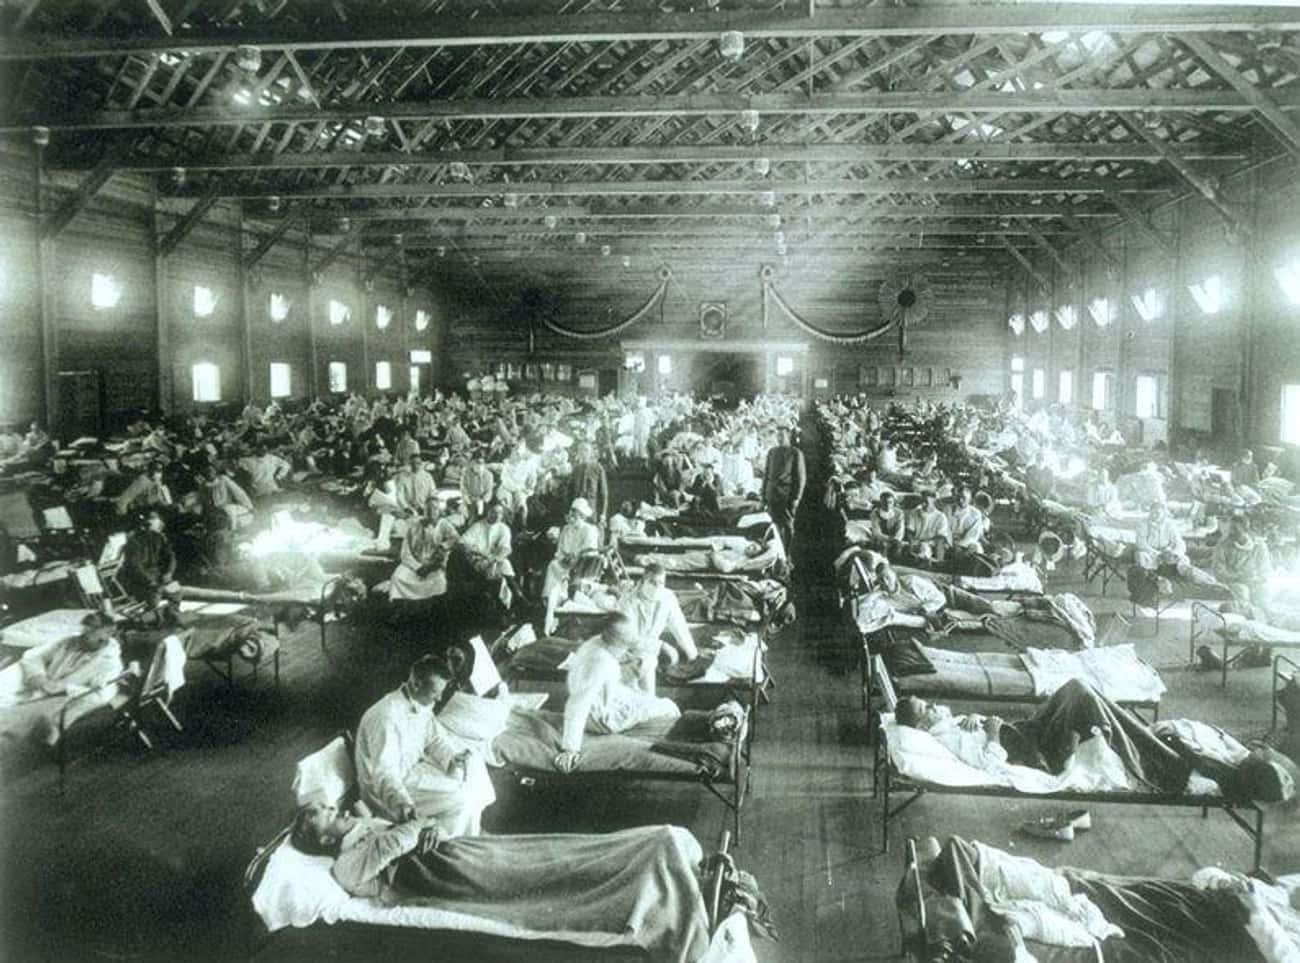 1918 Spanish Flu Pandemic